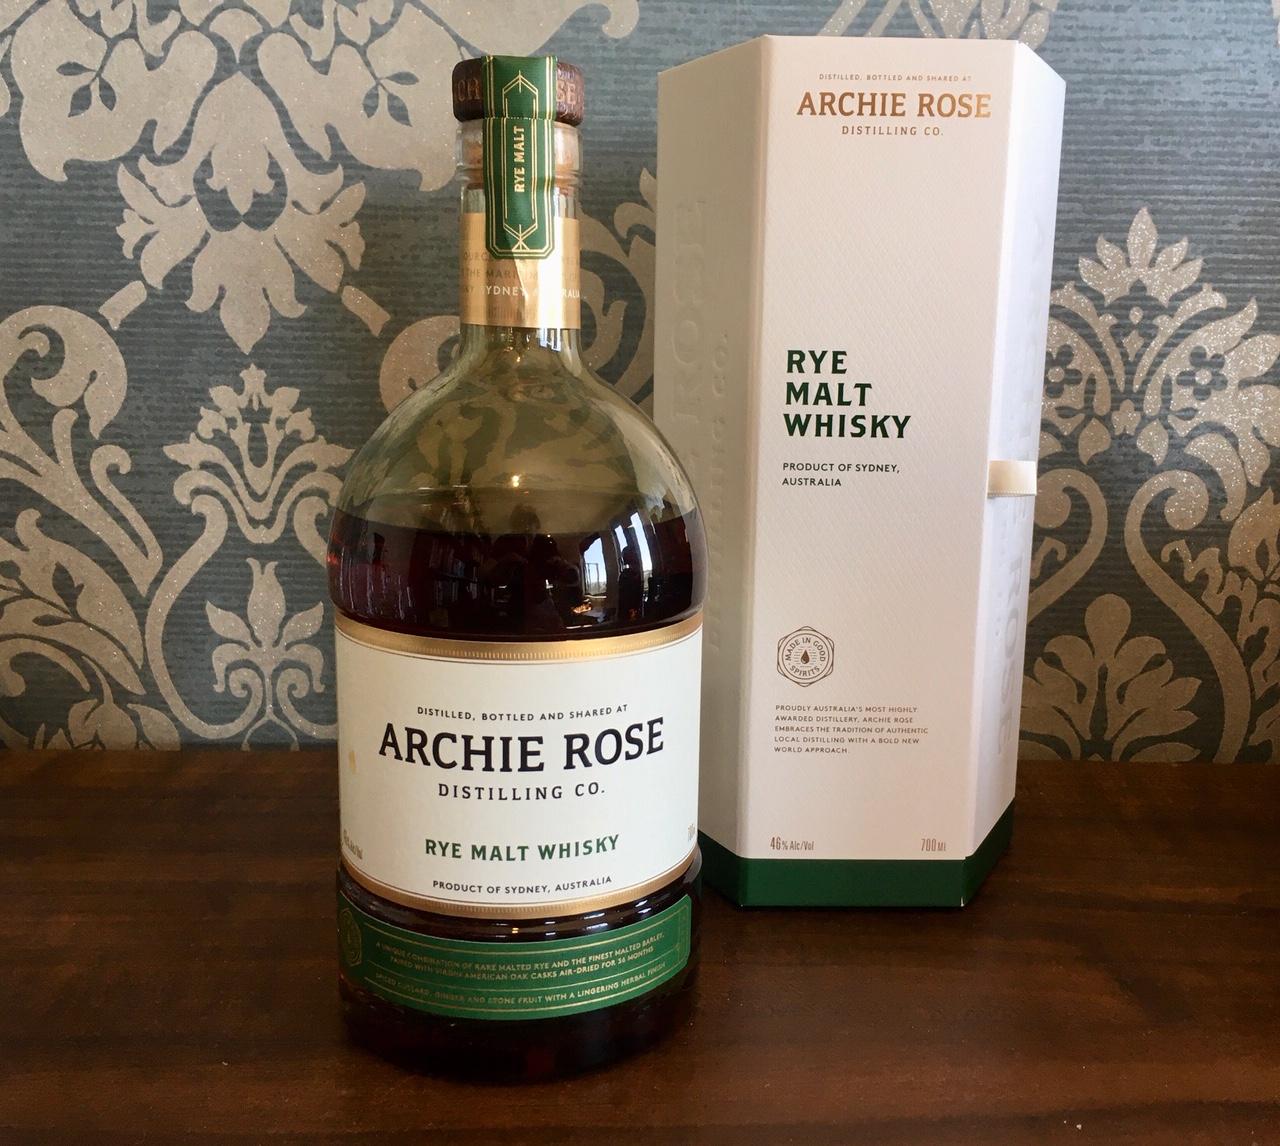 Archie Rose Rye Malt